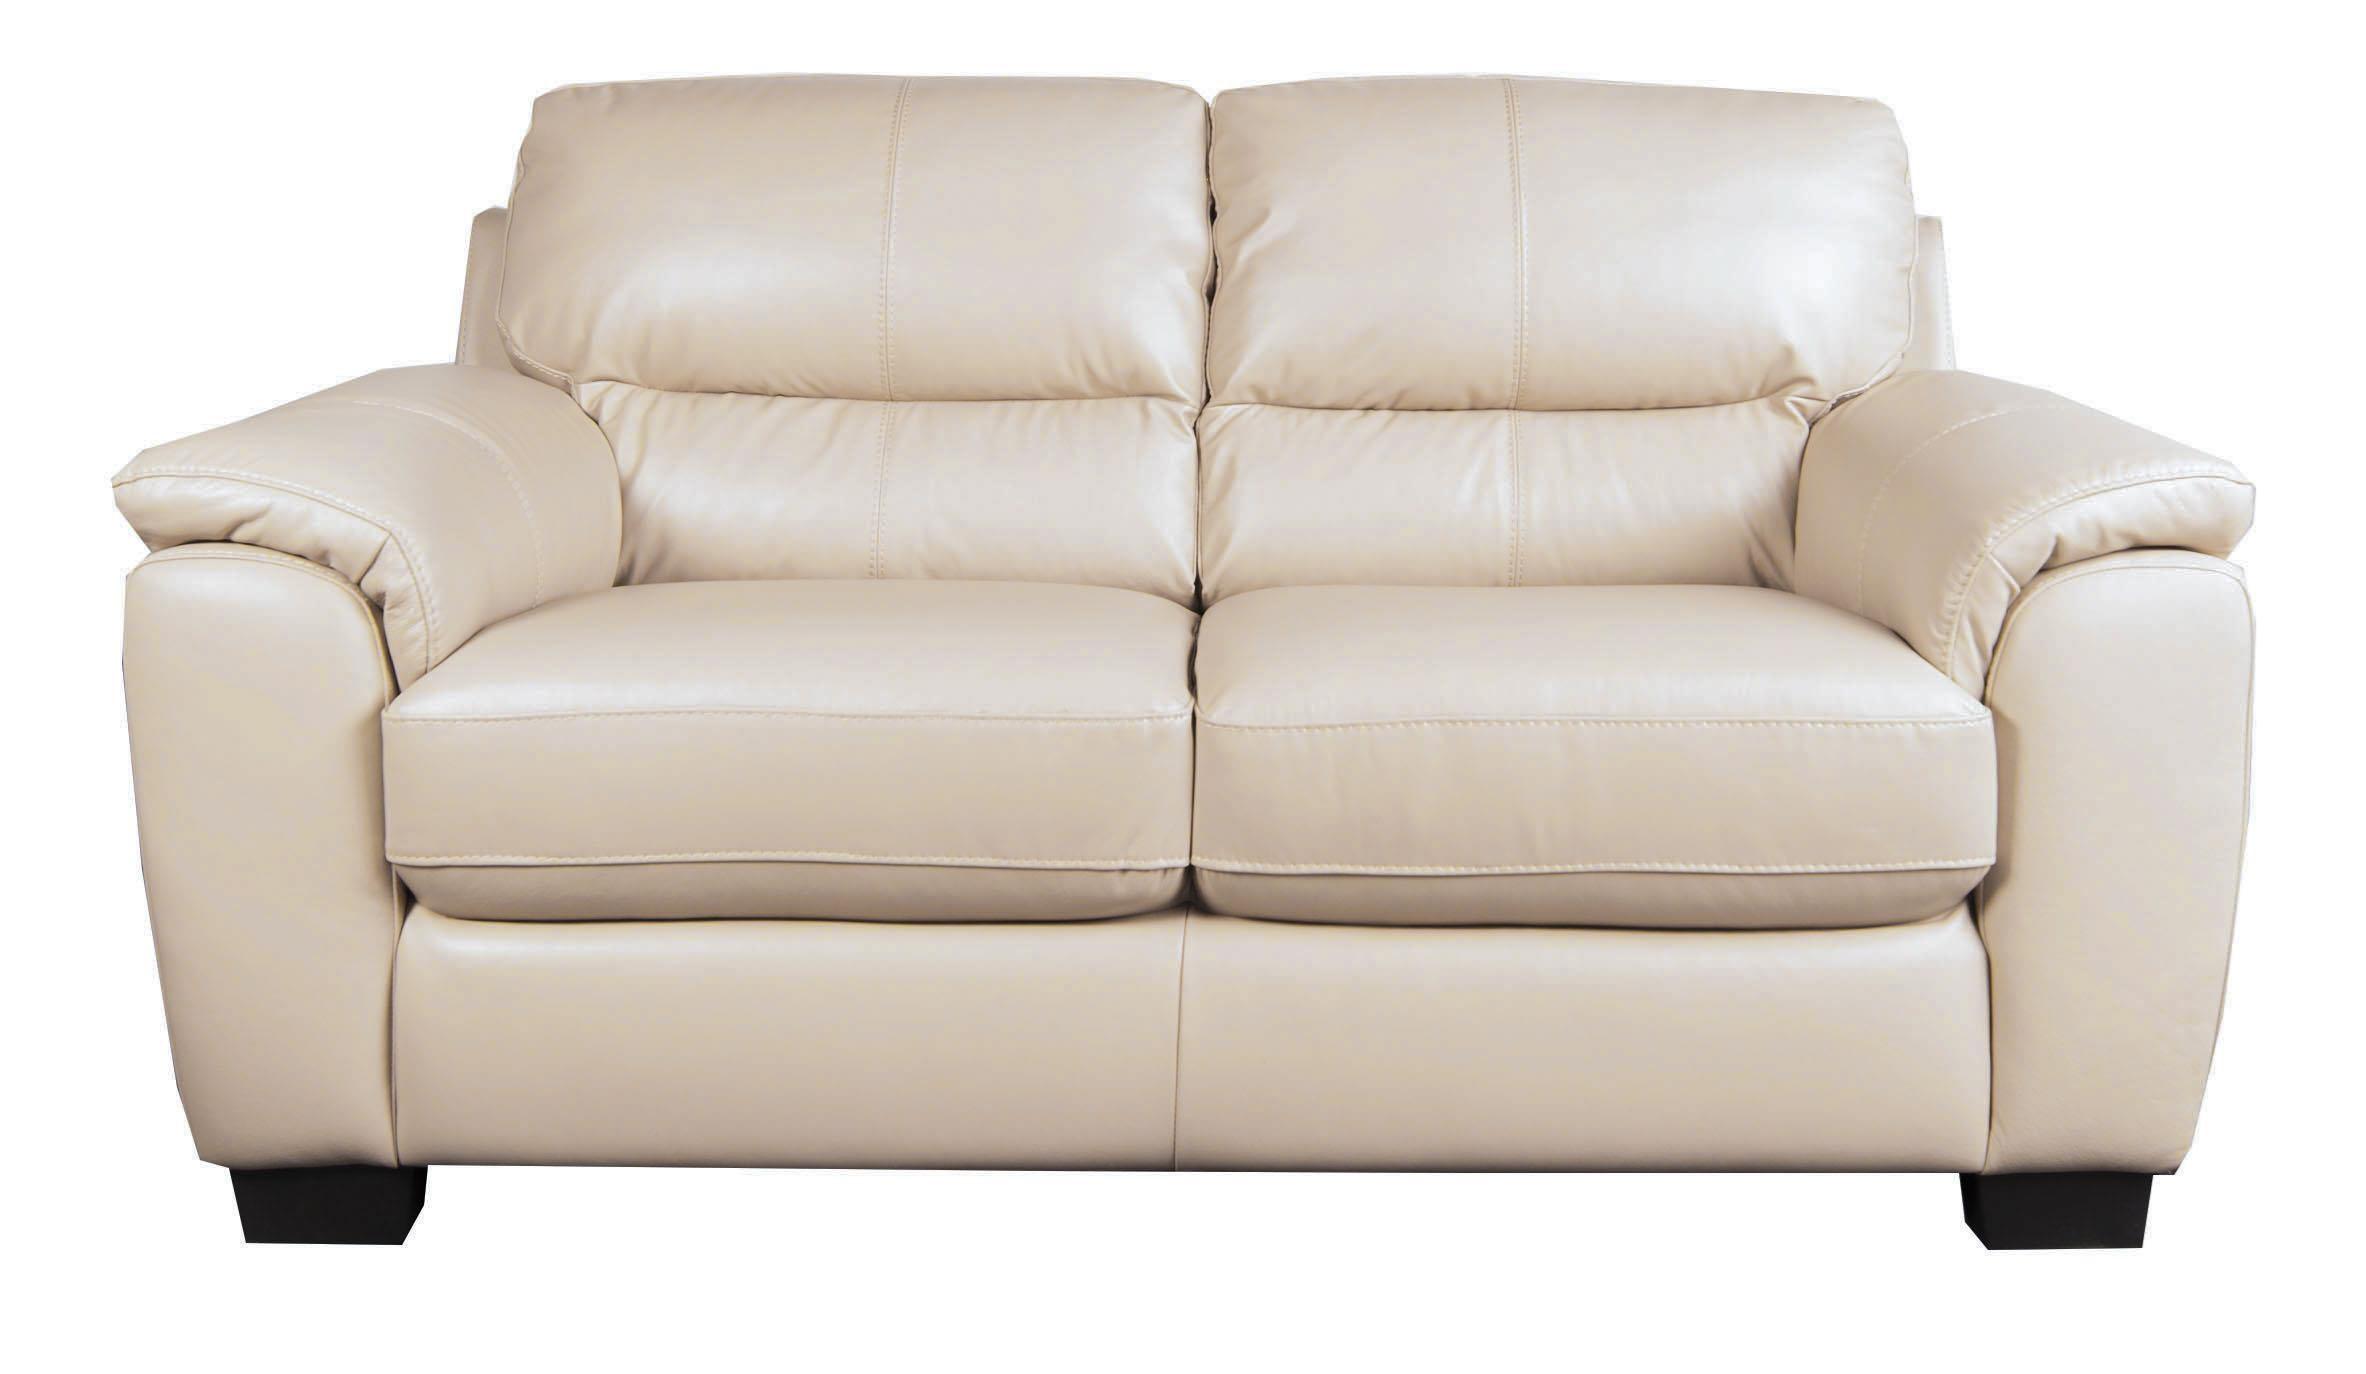 San Lorenzo Holt Holt 100% Leather Loveseat - Item Number: 622280165